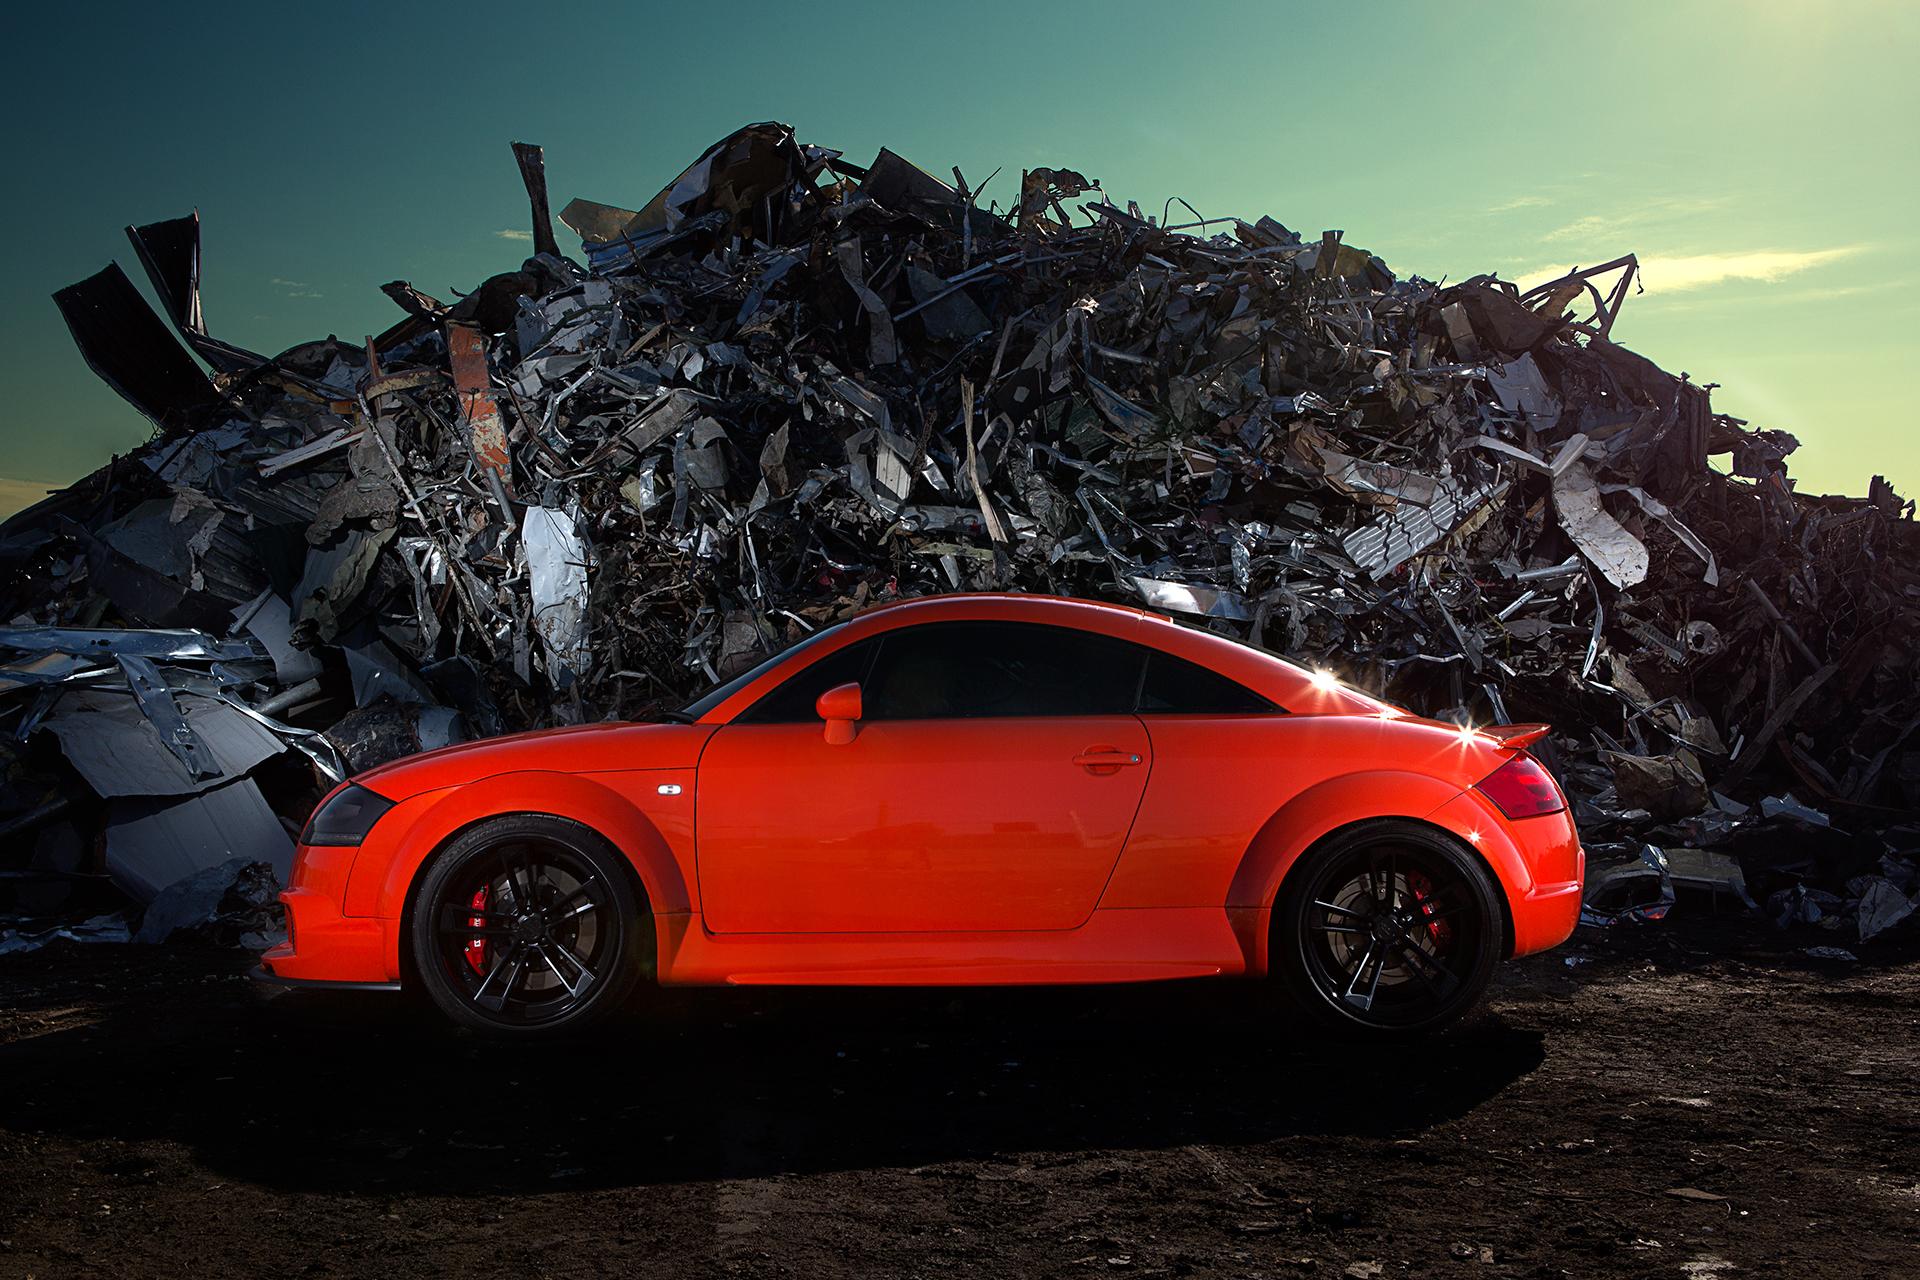 Audi Tt Wide Body Kit The Car 2000 Kits Source Forum View Topic Dmc Under Development